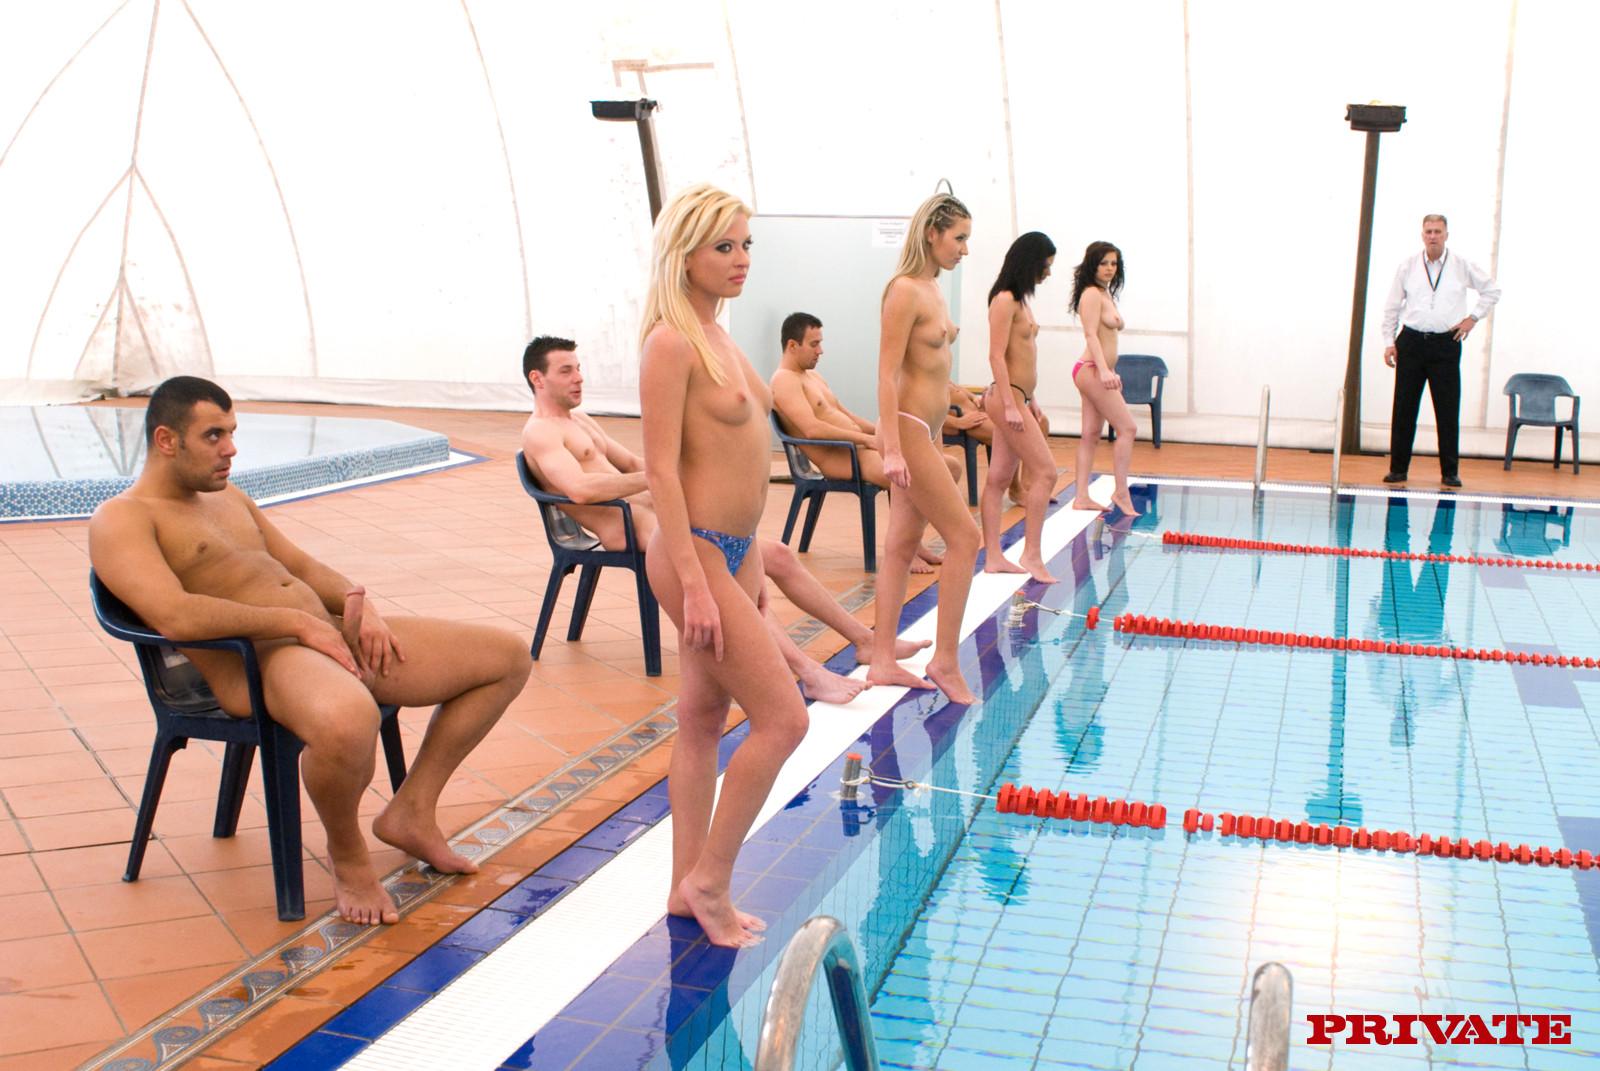 Swimming school porn, tournoi hockey mineur midget tiger geant